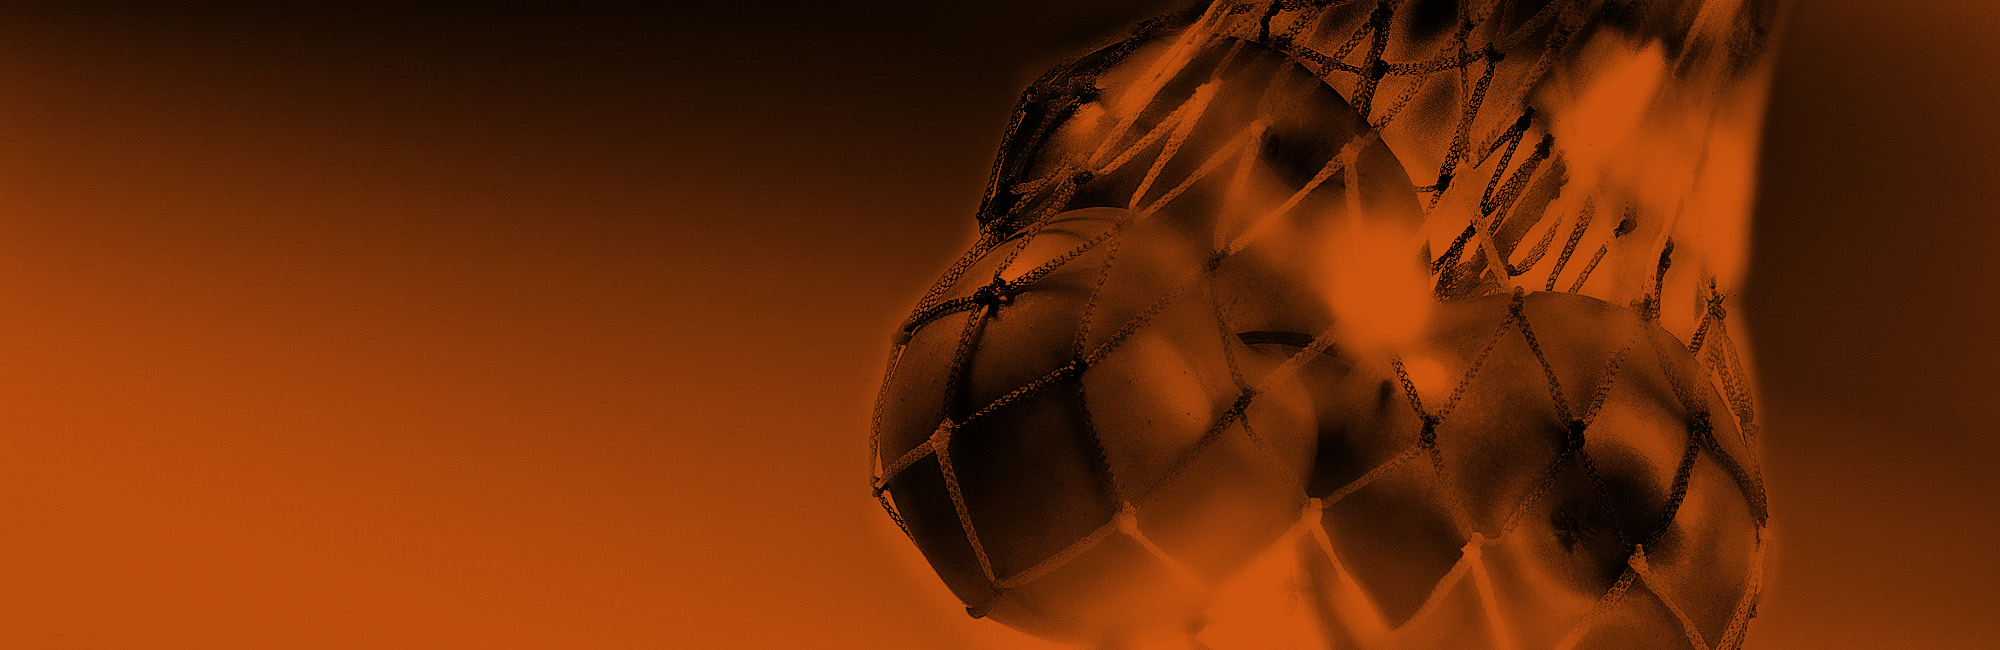 Webdesign_orange_Imagebild